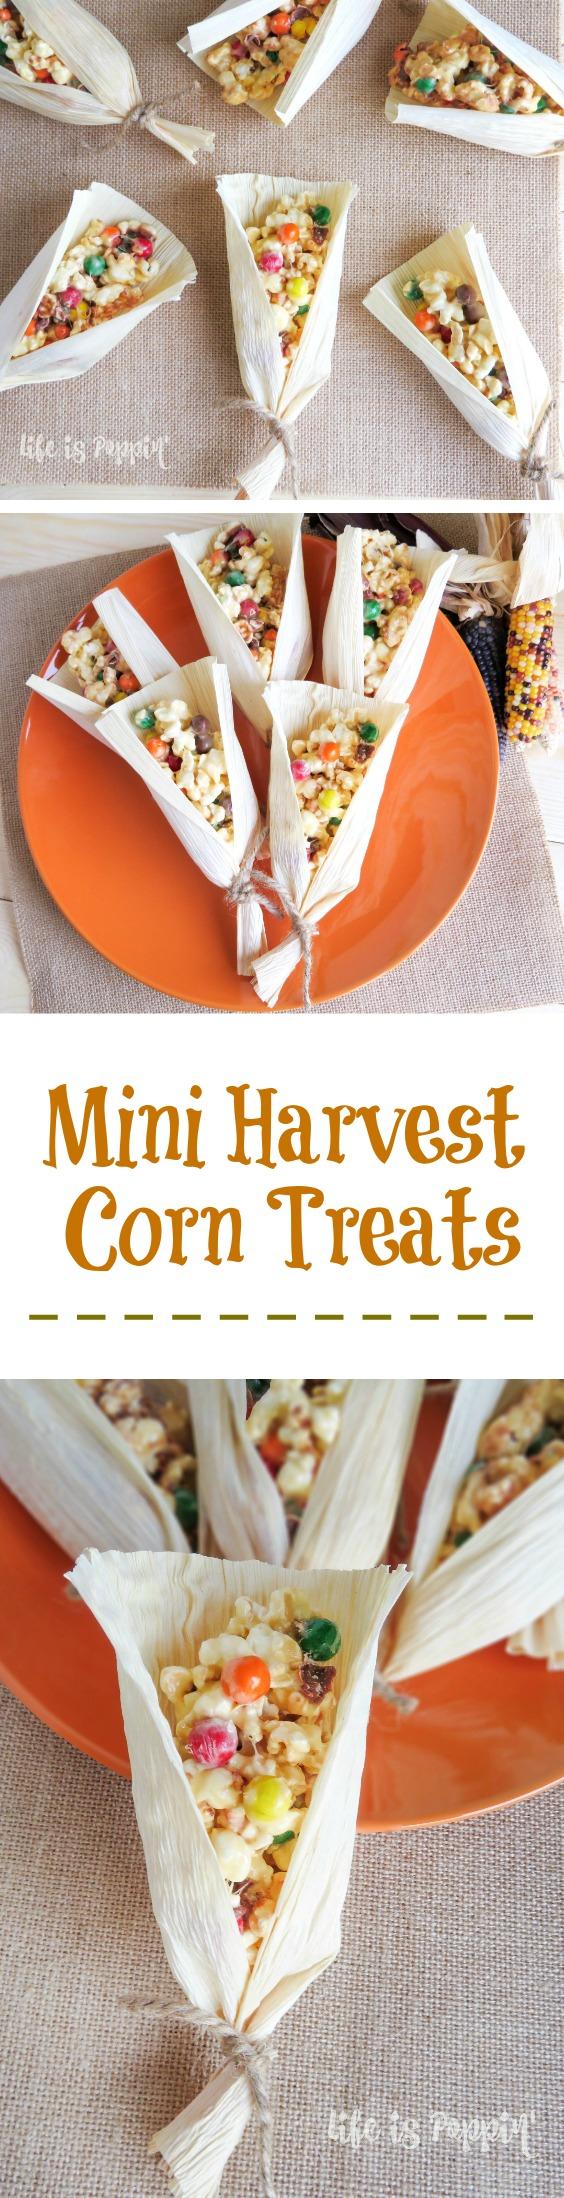 mini-harvest-corn-treats-pinterest